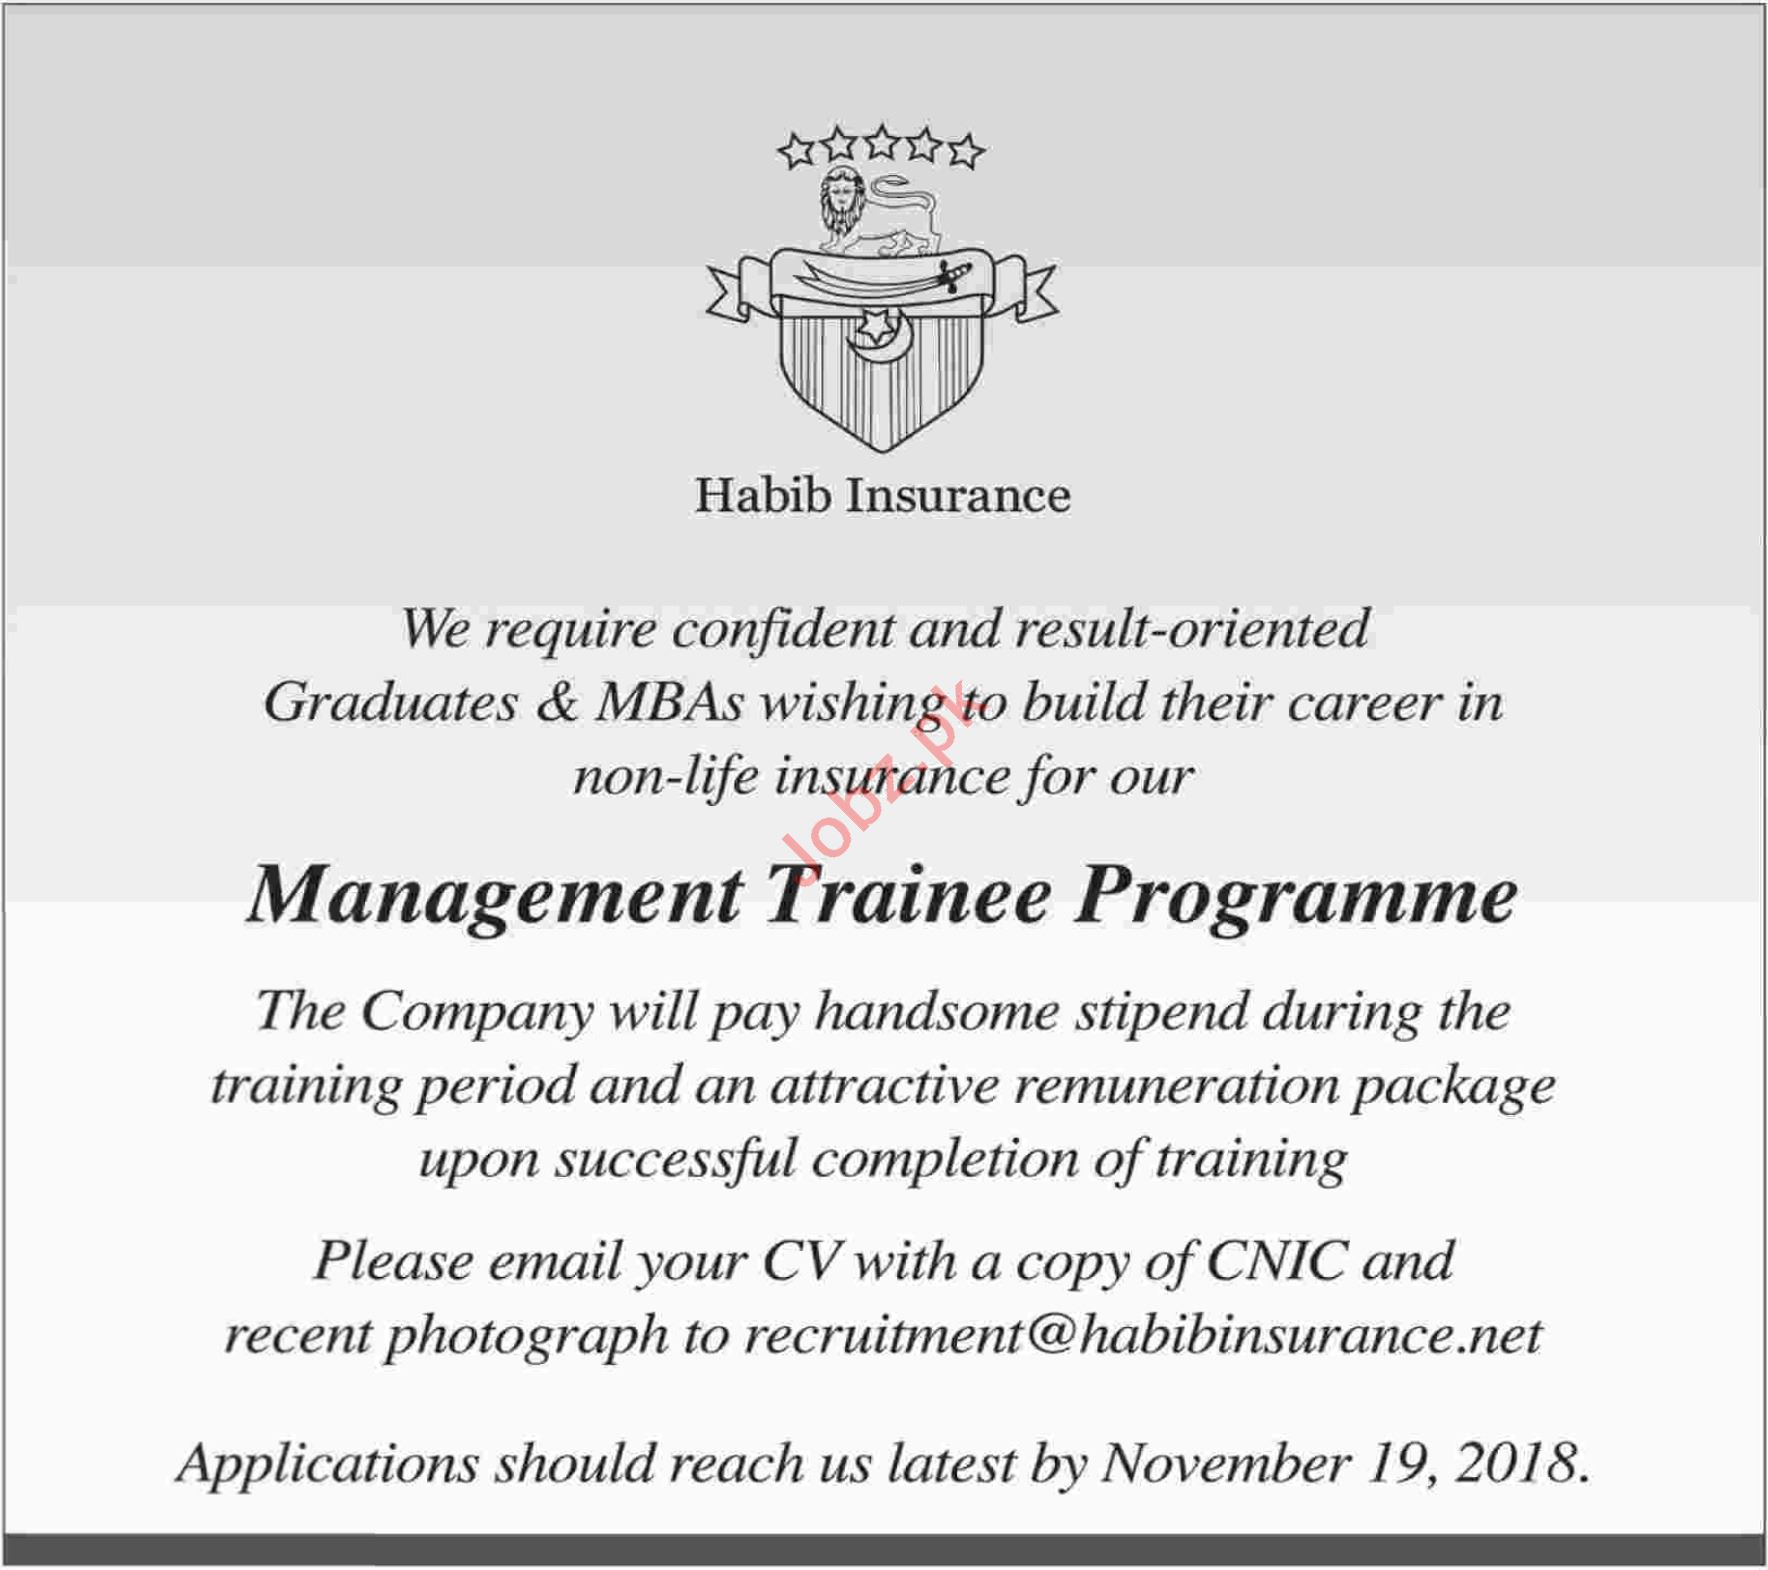 Habib Insurance Job 2018 Management Trainee Programme